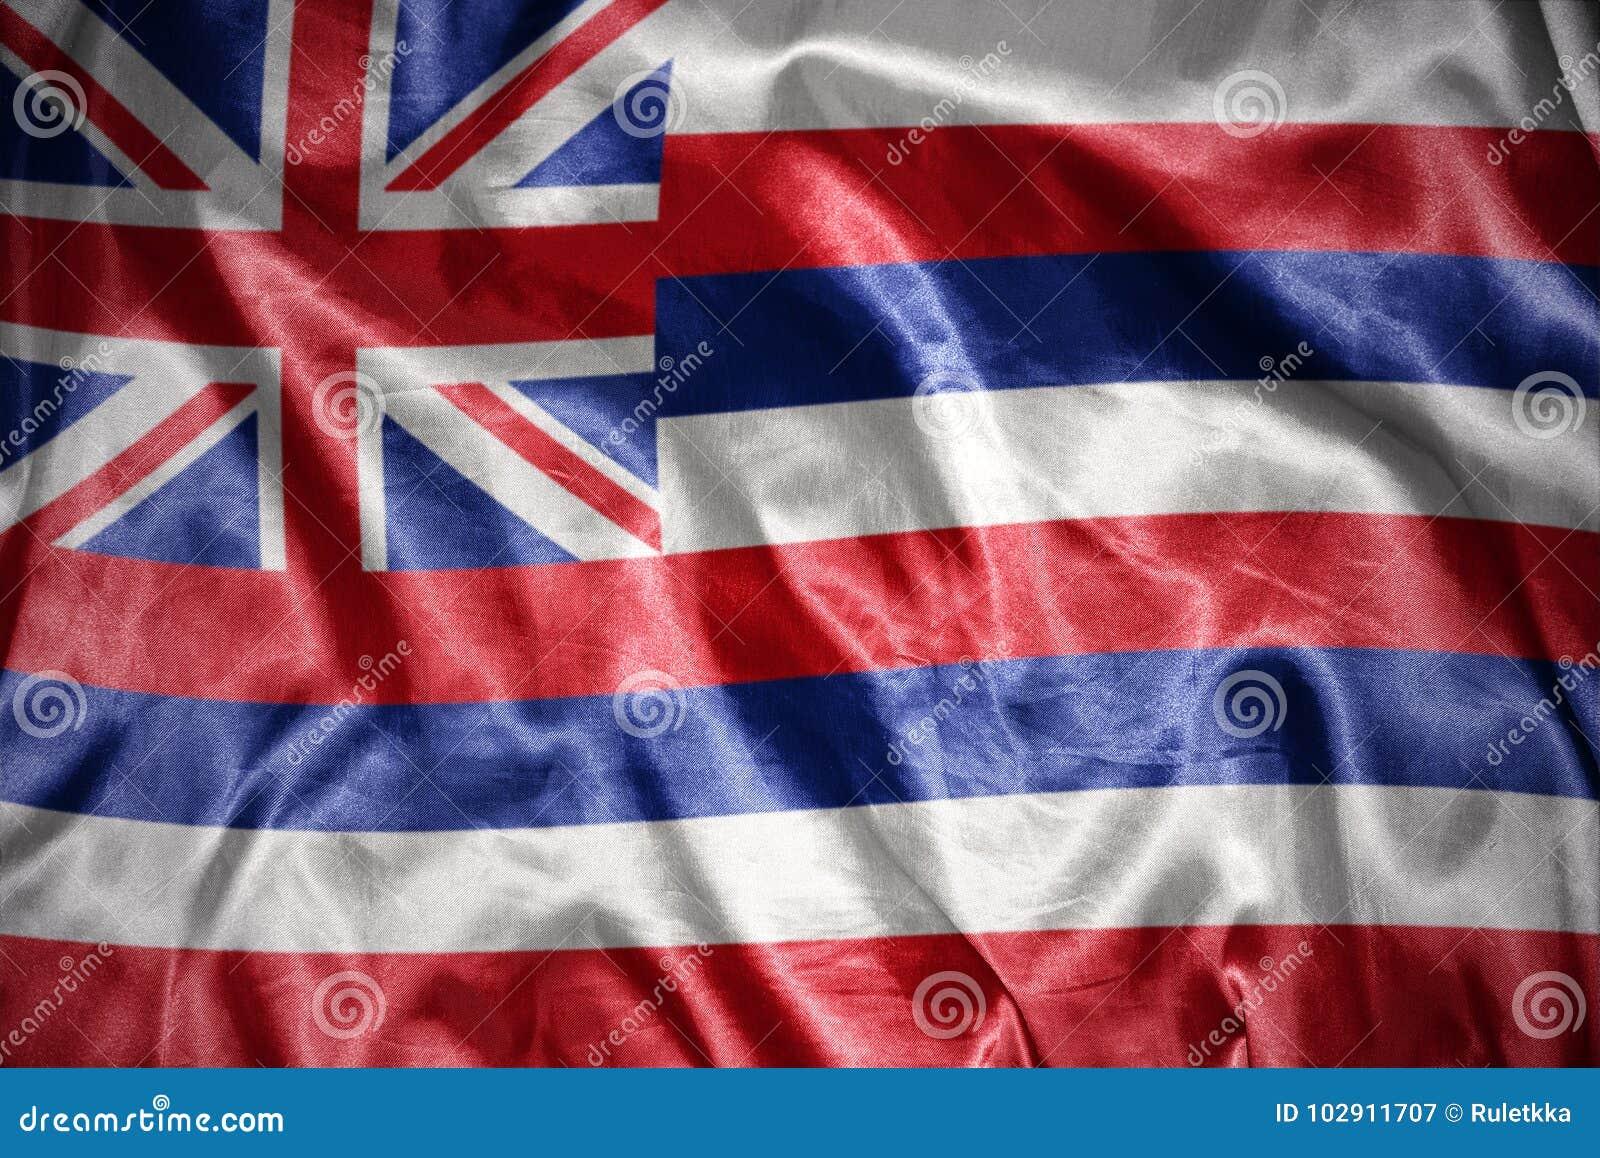 shining hawaii state flag